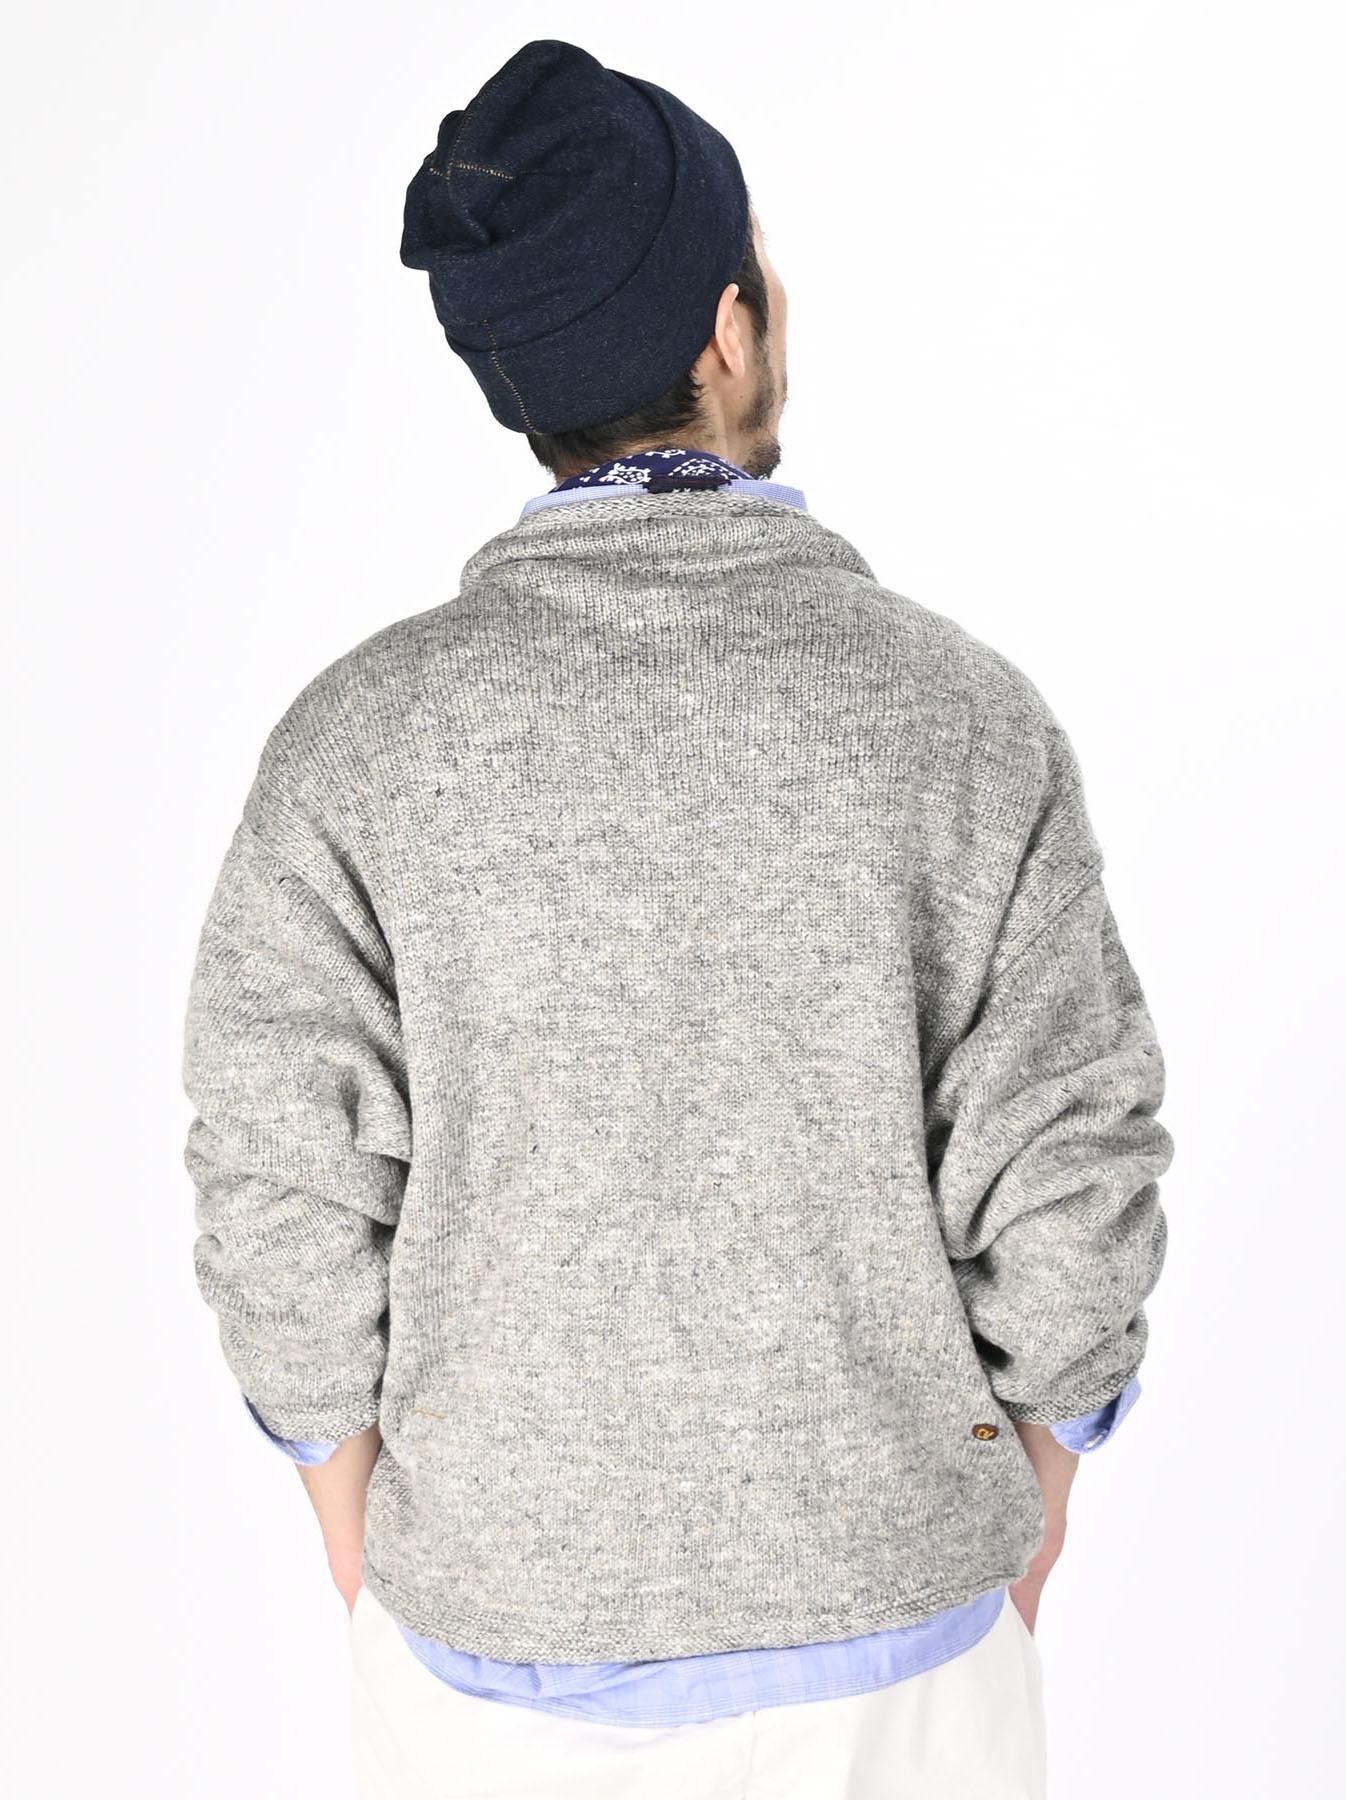 WH Linen Tweed Knit-sew 908 Umahiko Sweater (0321)-5